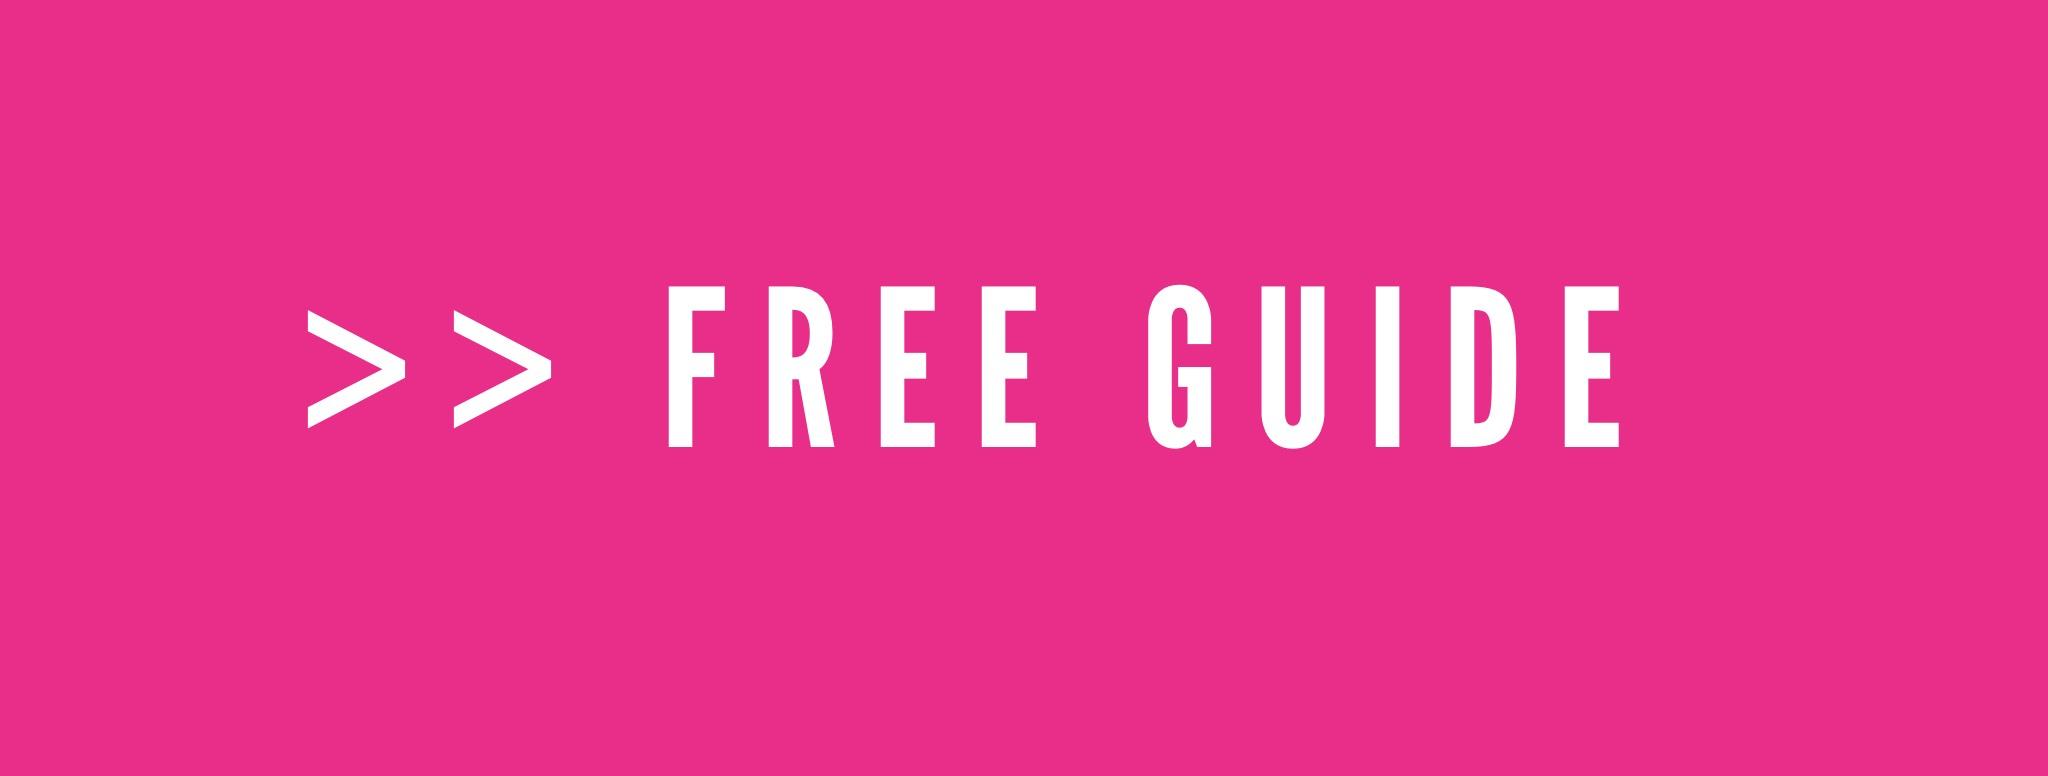 free-guide-button-gutsygirlclub.jpg